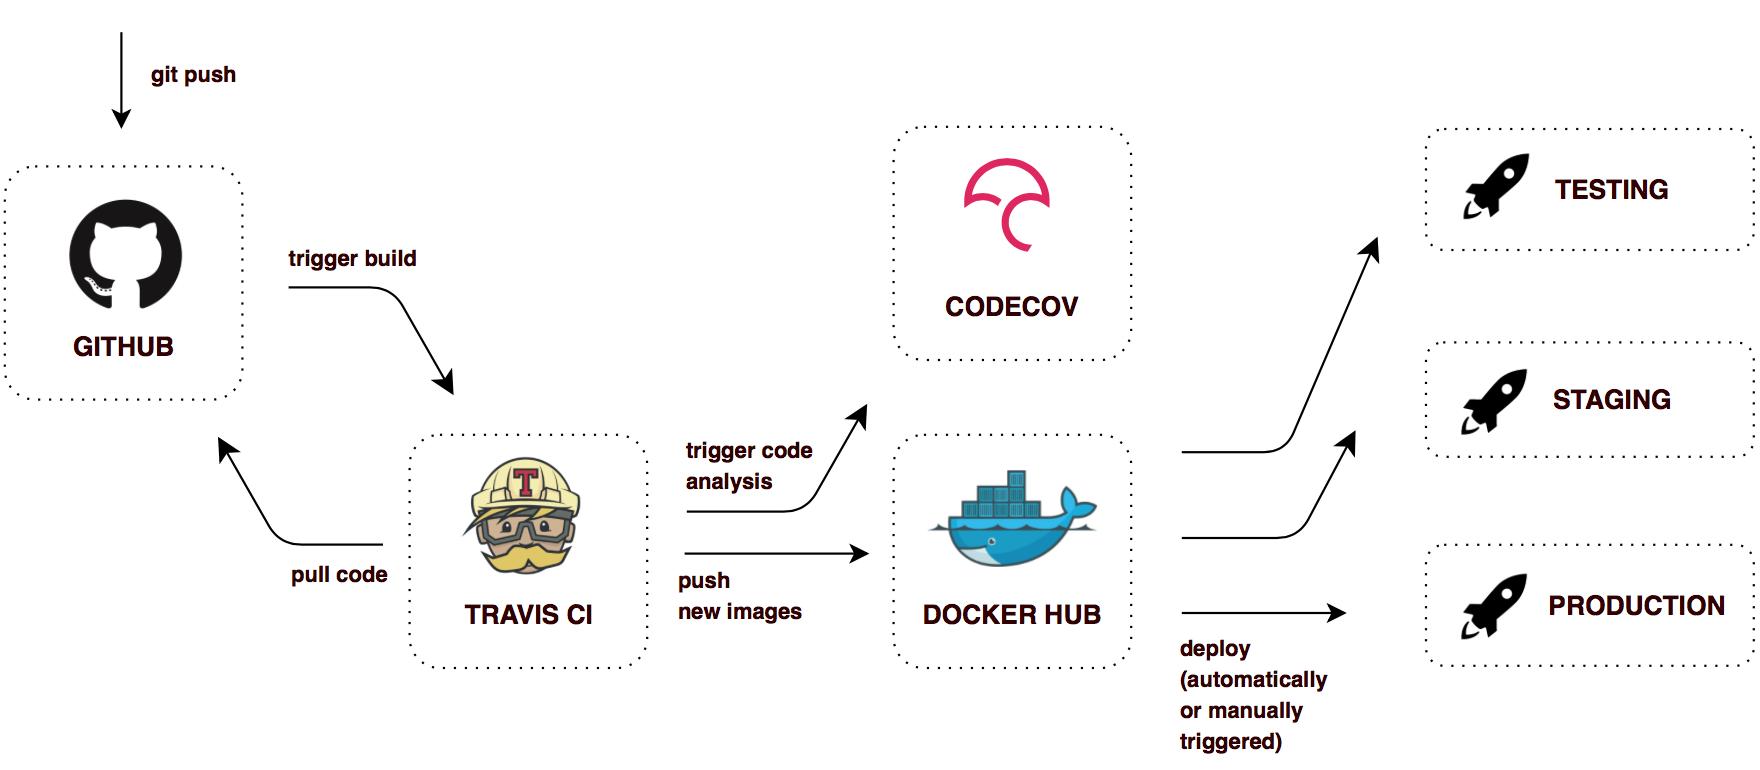 GitHub - sqshq/PiggyMetrics: Microservice Architecture with